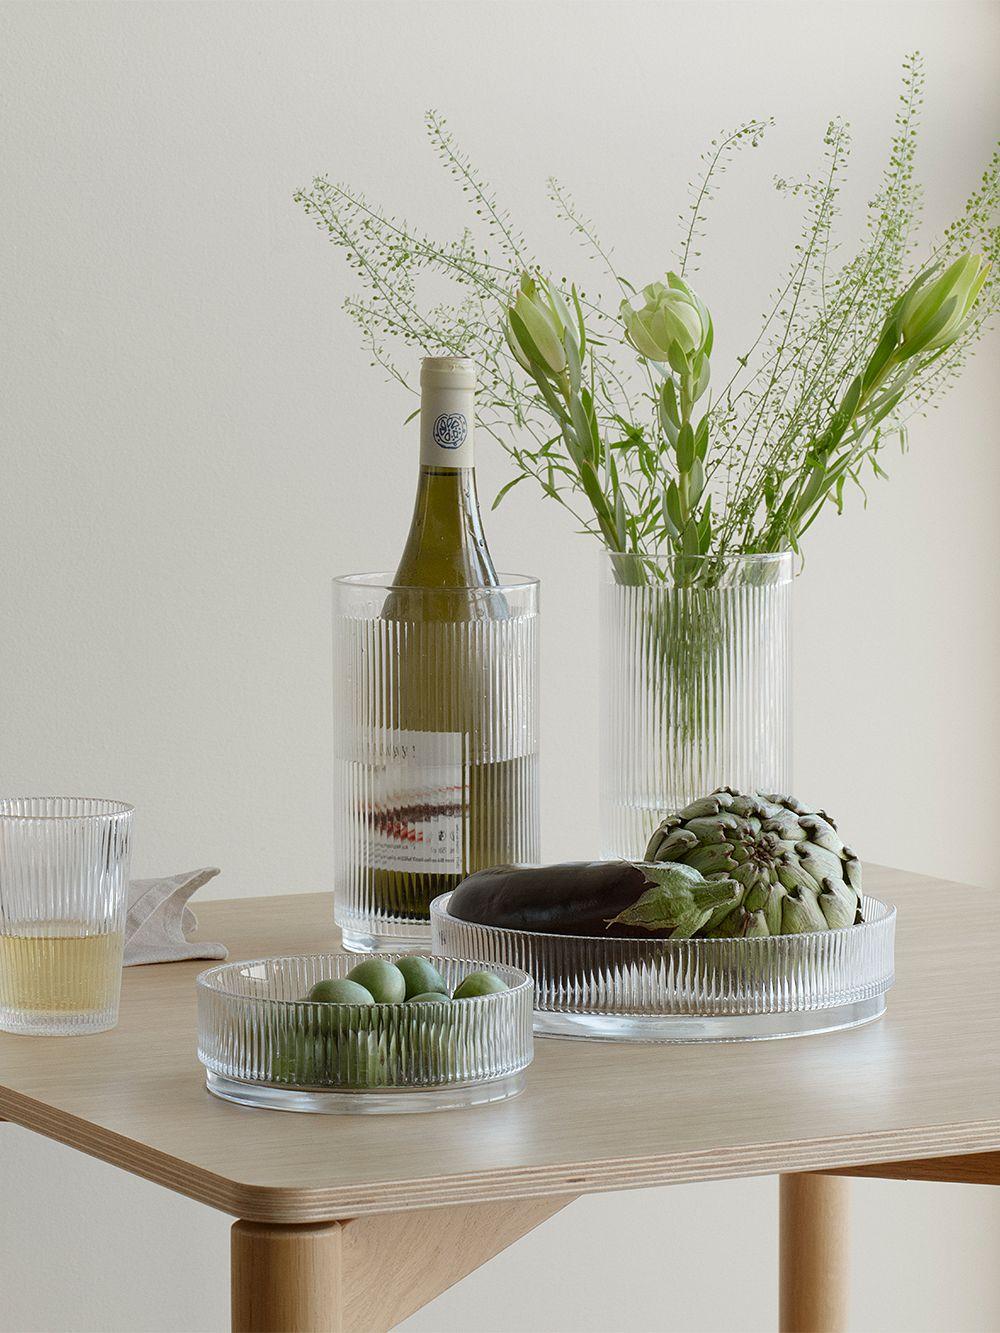 Stelton Pilastro wine cooler